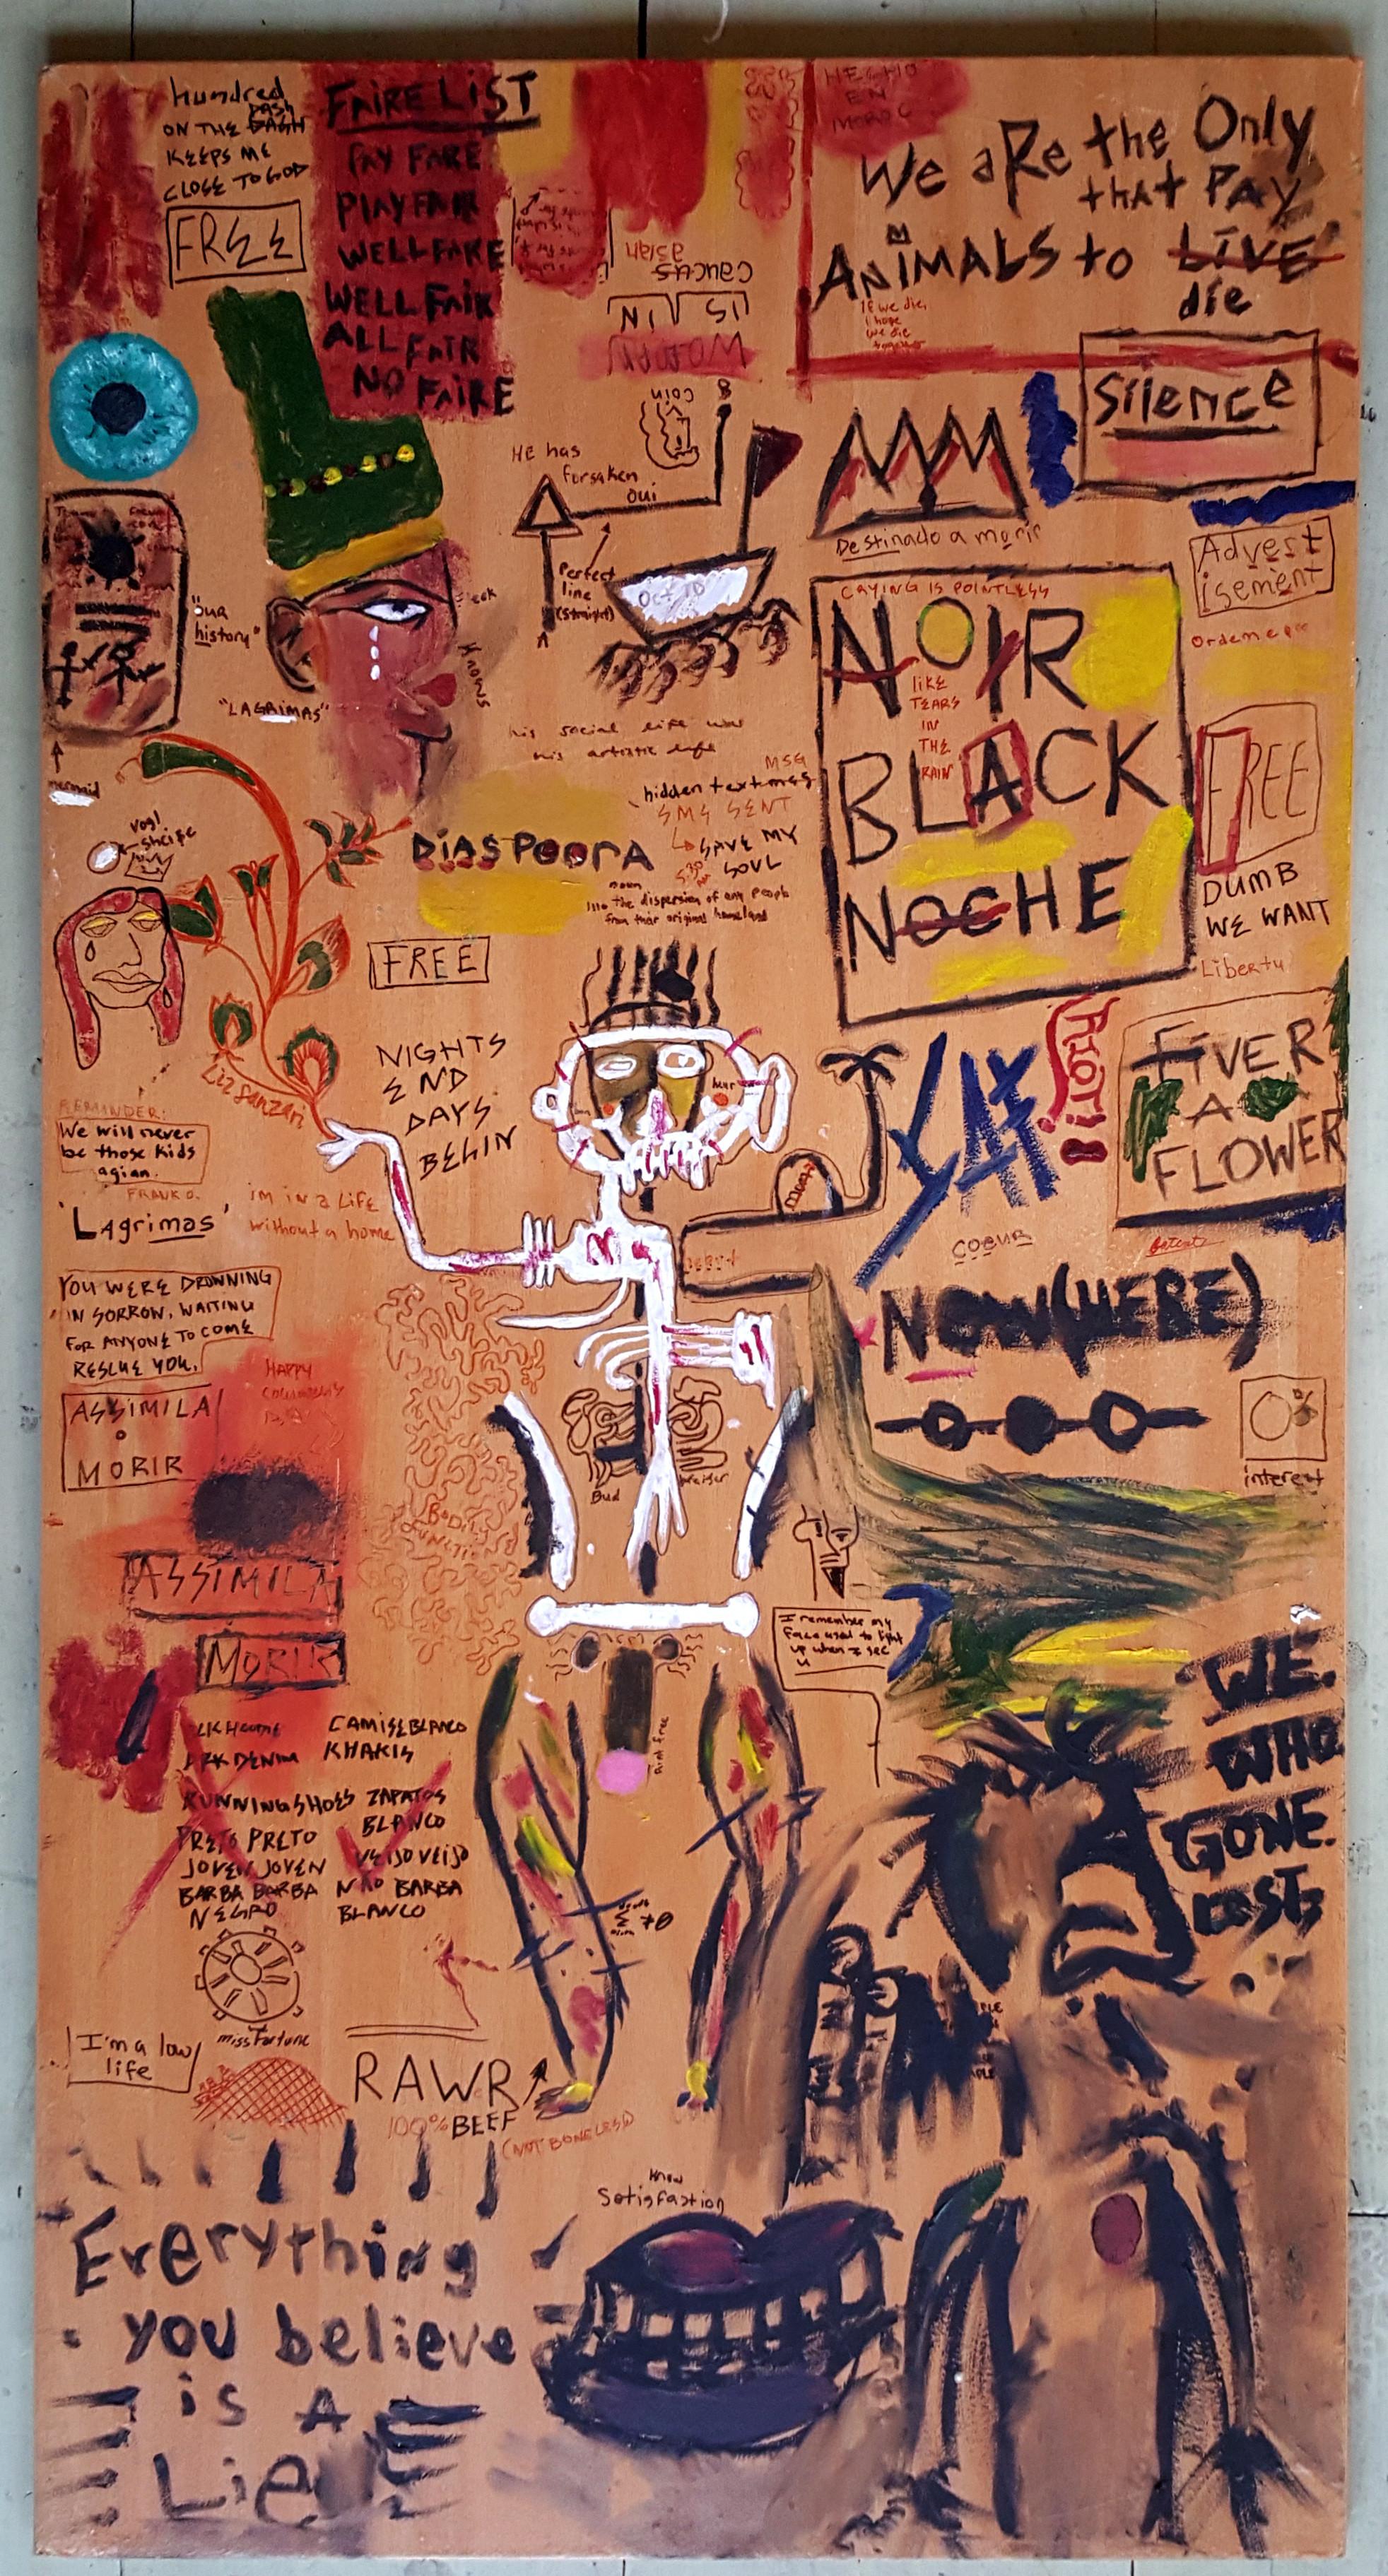 Basquiat-Like Painting/Graffiti - Up Till Dawn